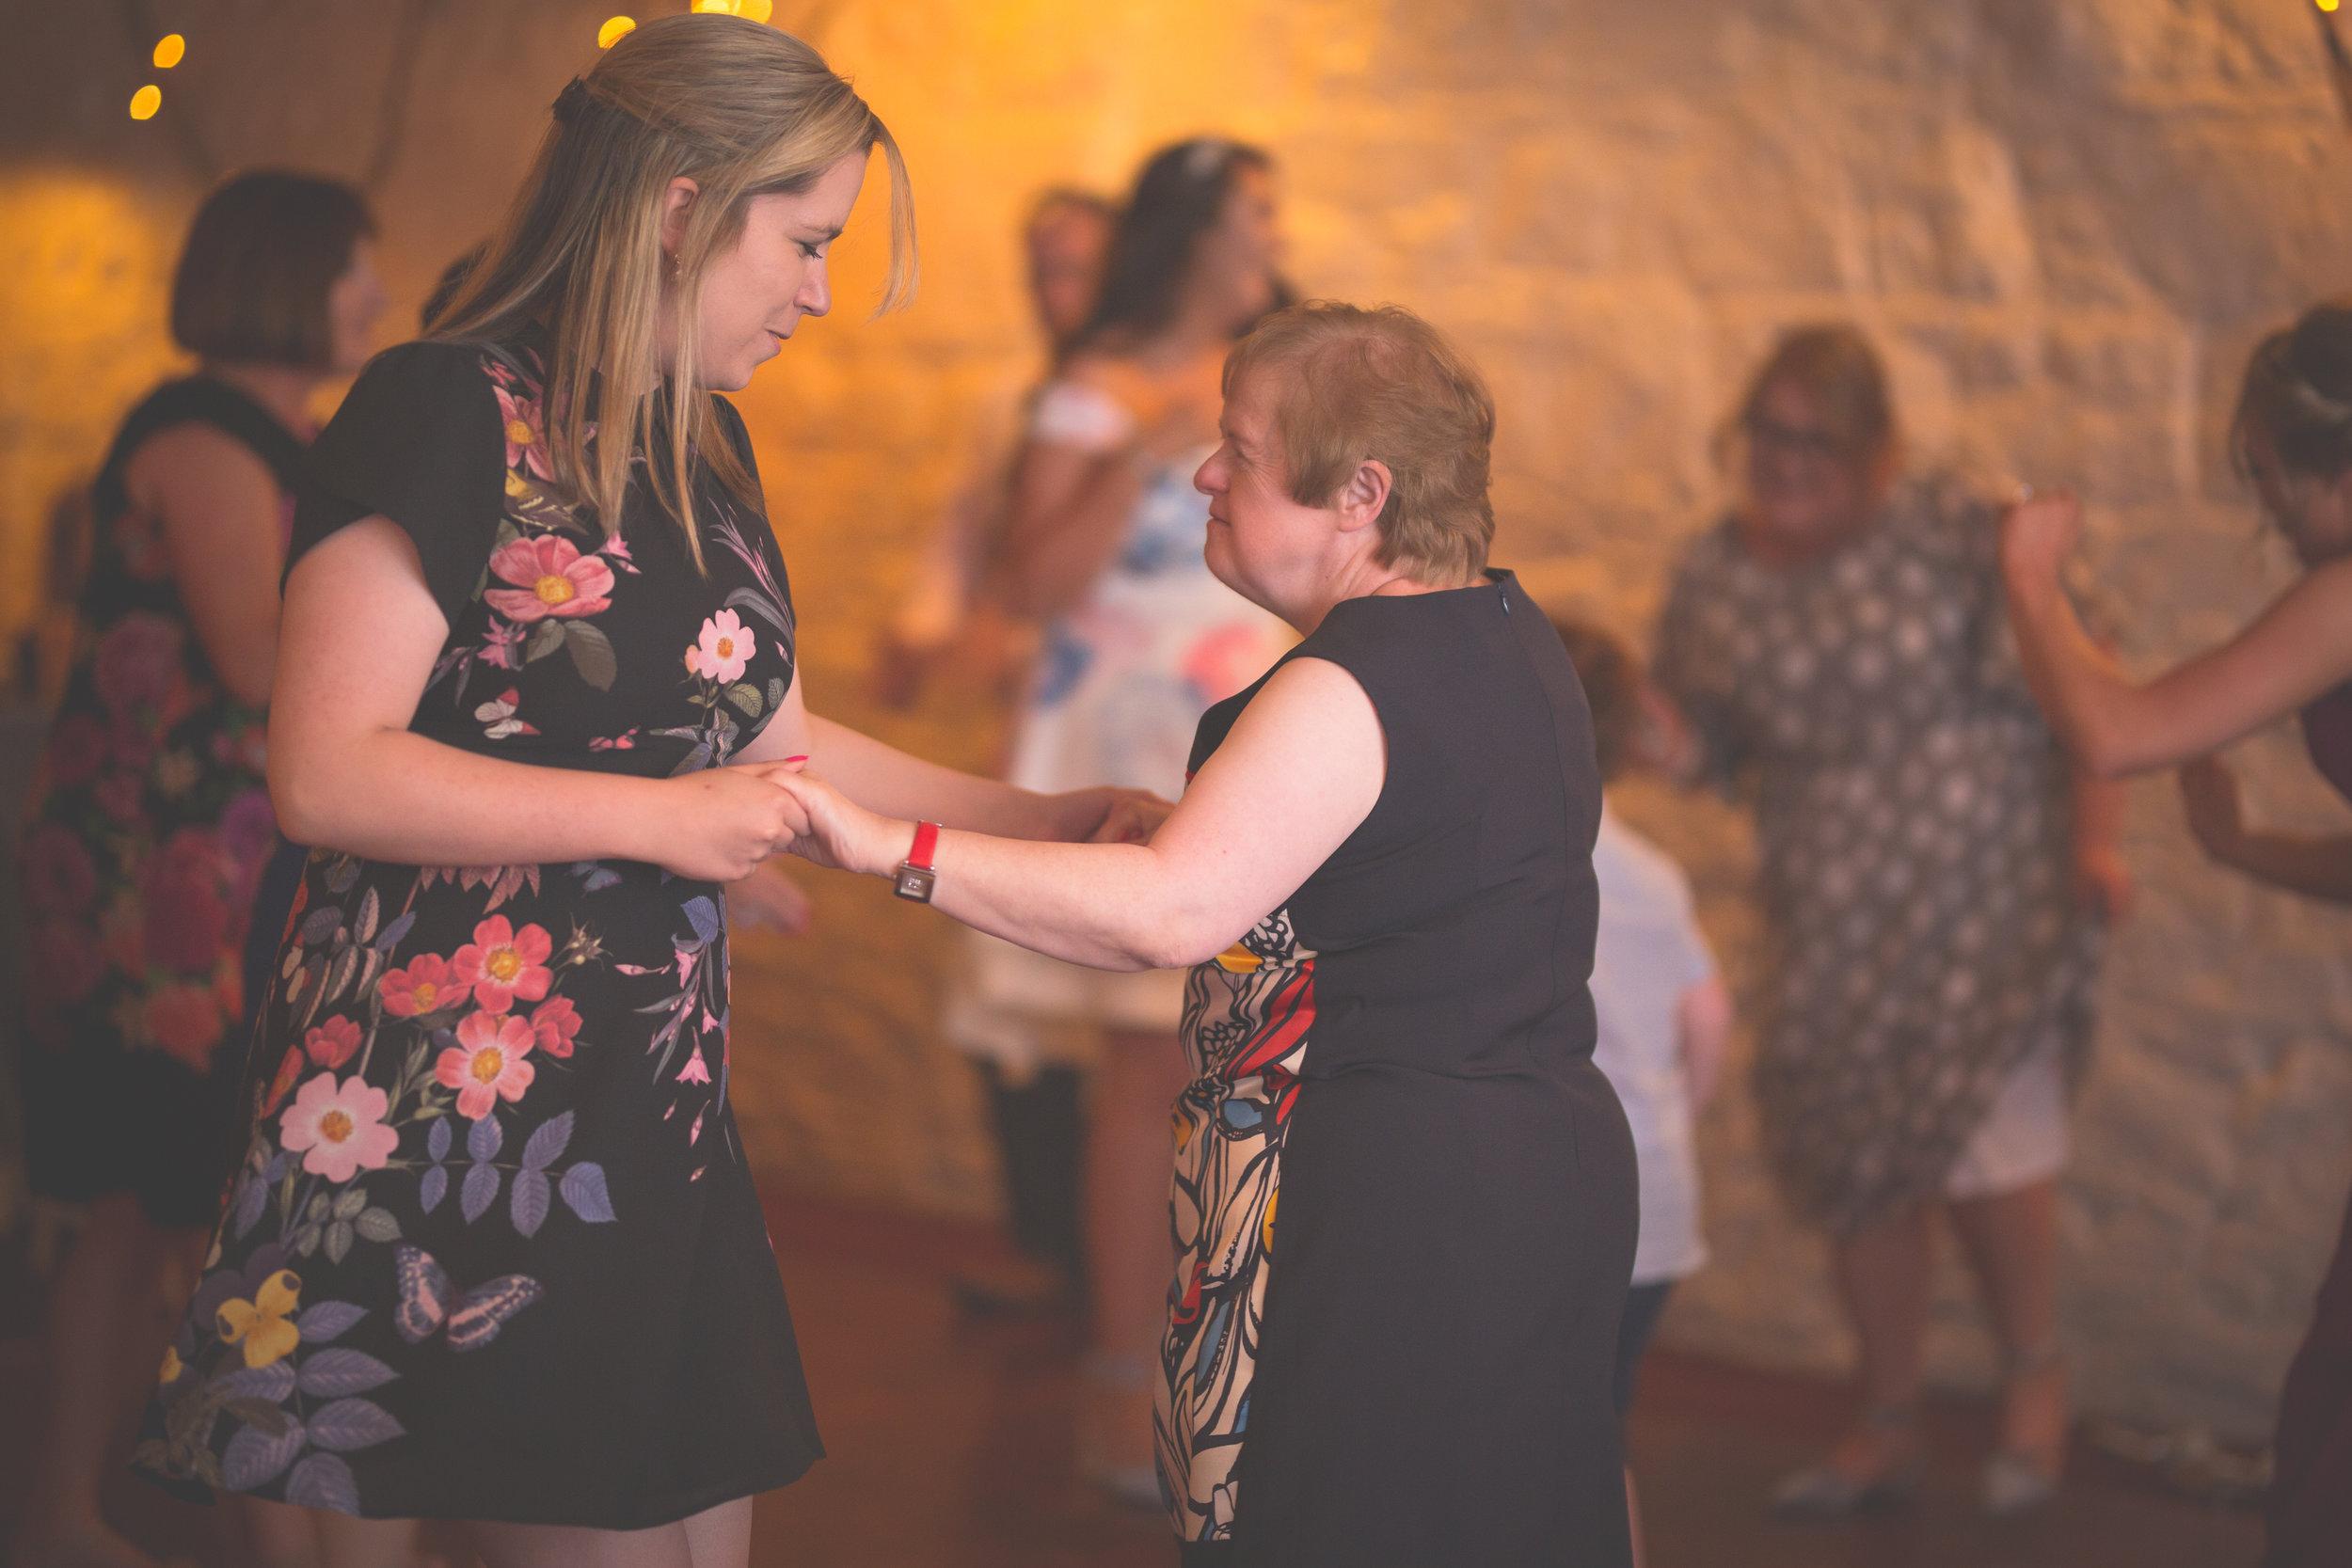 Brian McEwan Wedding Photography | Carol-Annee & Sean | The Dancing-94.jpg